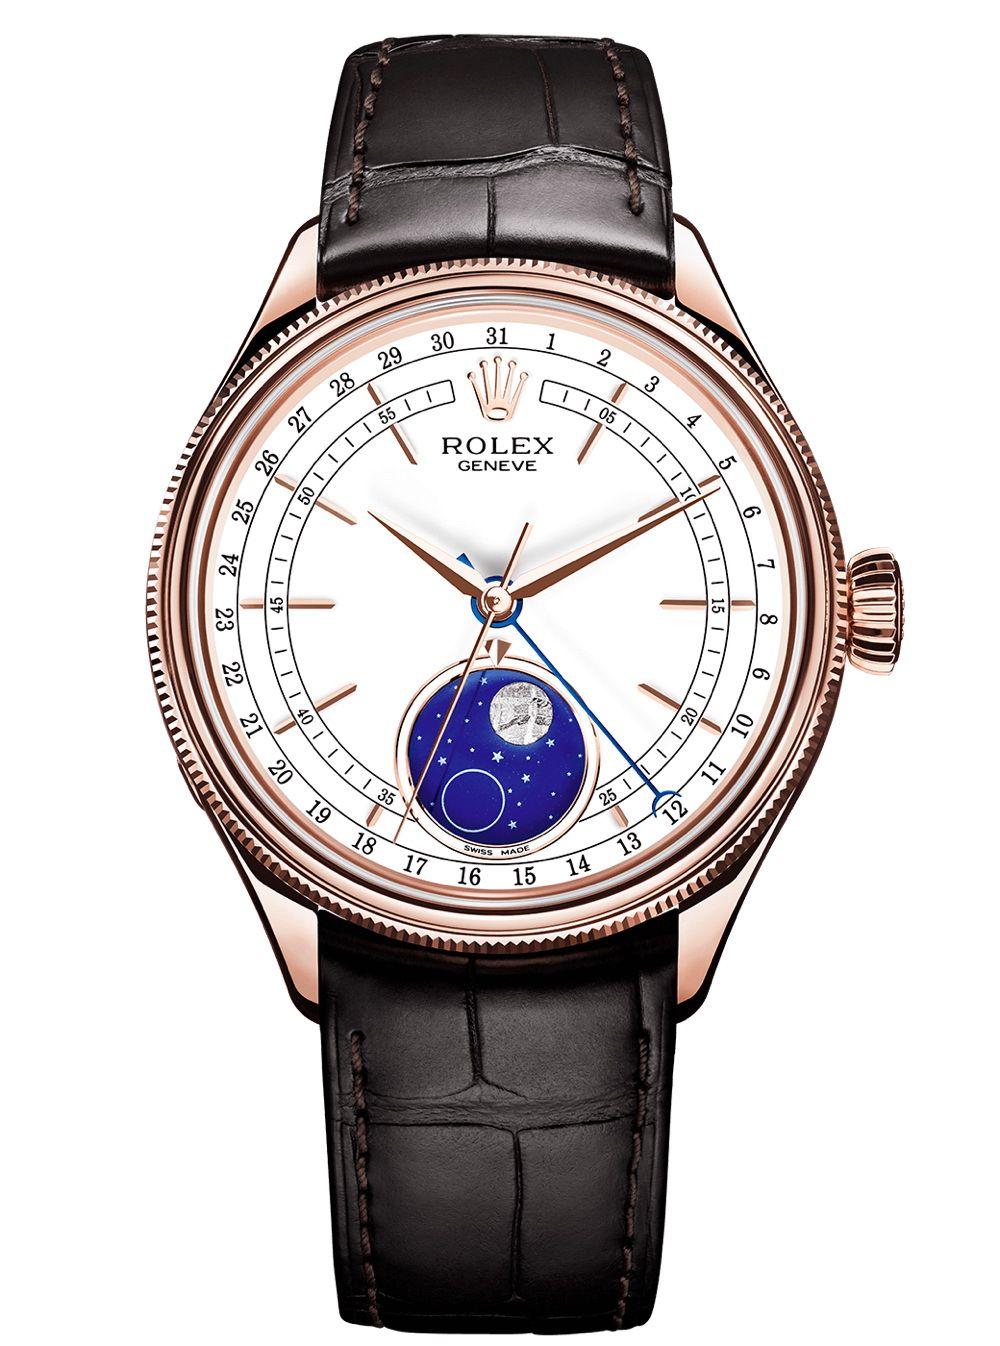 c30d7ff3bb8 2017 Rolex Moon Phase Cellini - Rolex Geneve dial - Perpetuelle ...